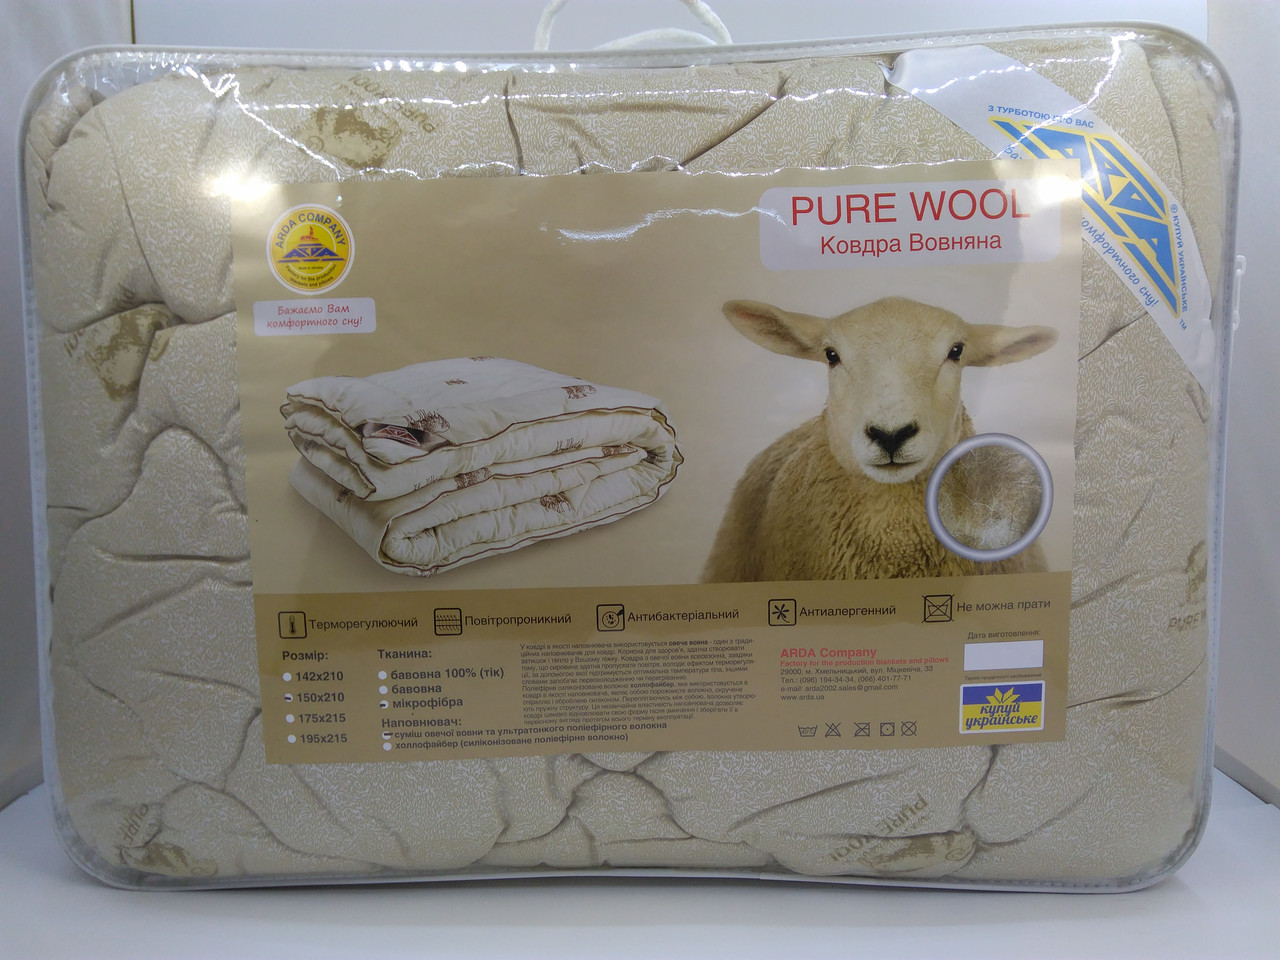 Одеяло Шерстяное Pure Wool 195*215 ARDA Company